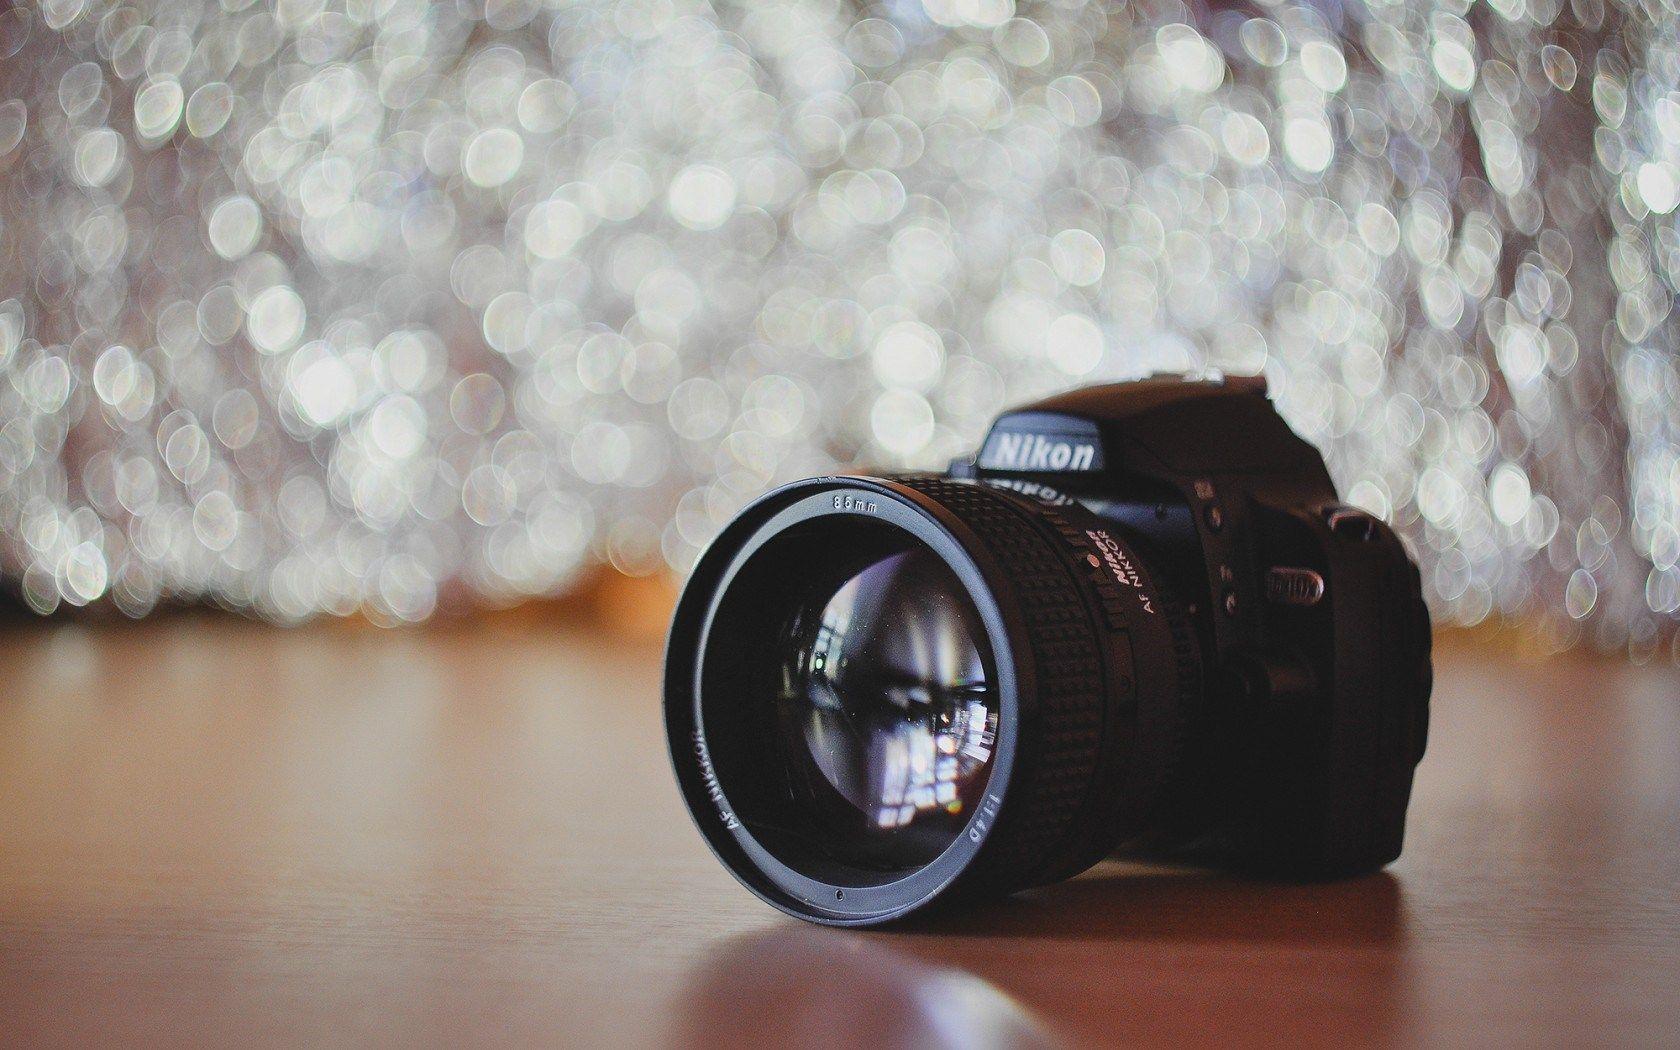 Nikon Wallpapers - Wallpaper Cave